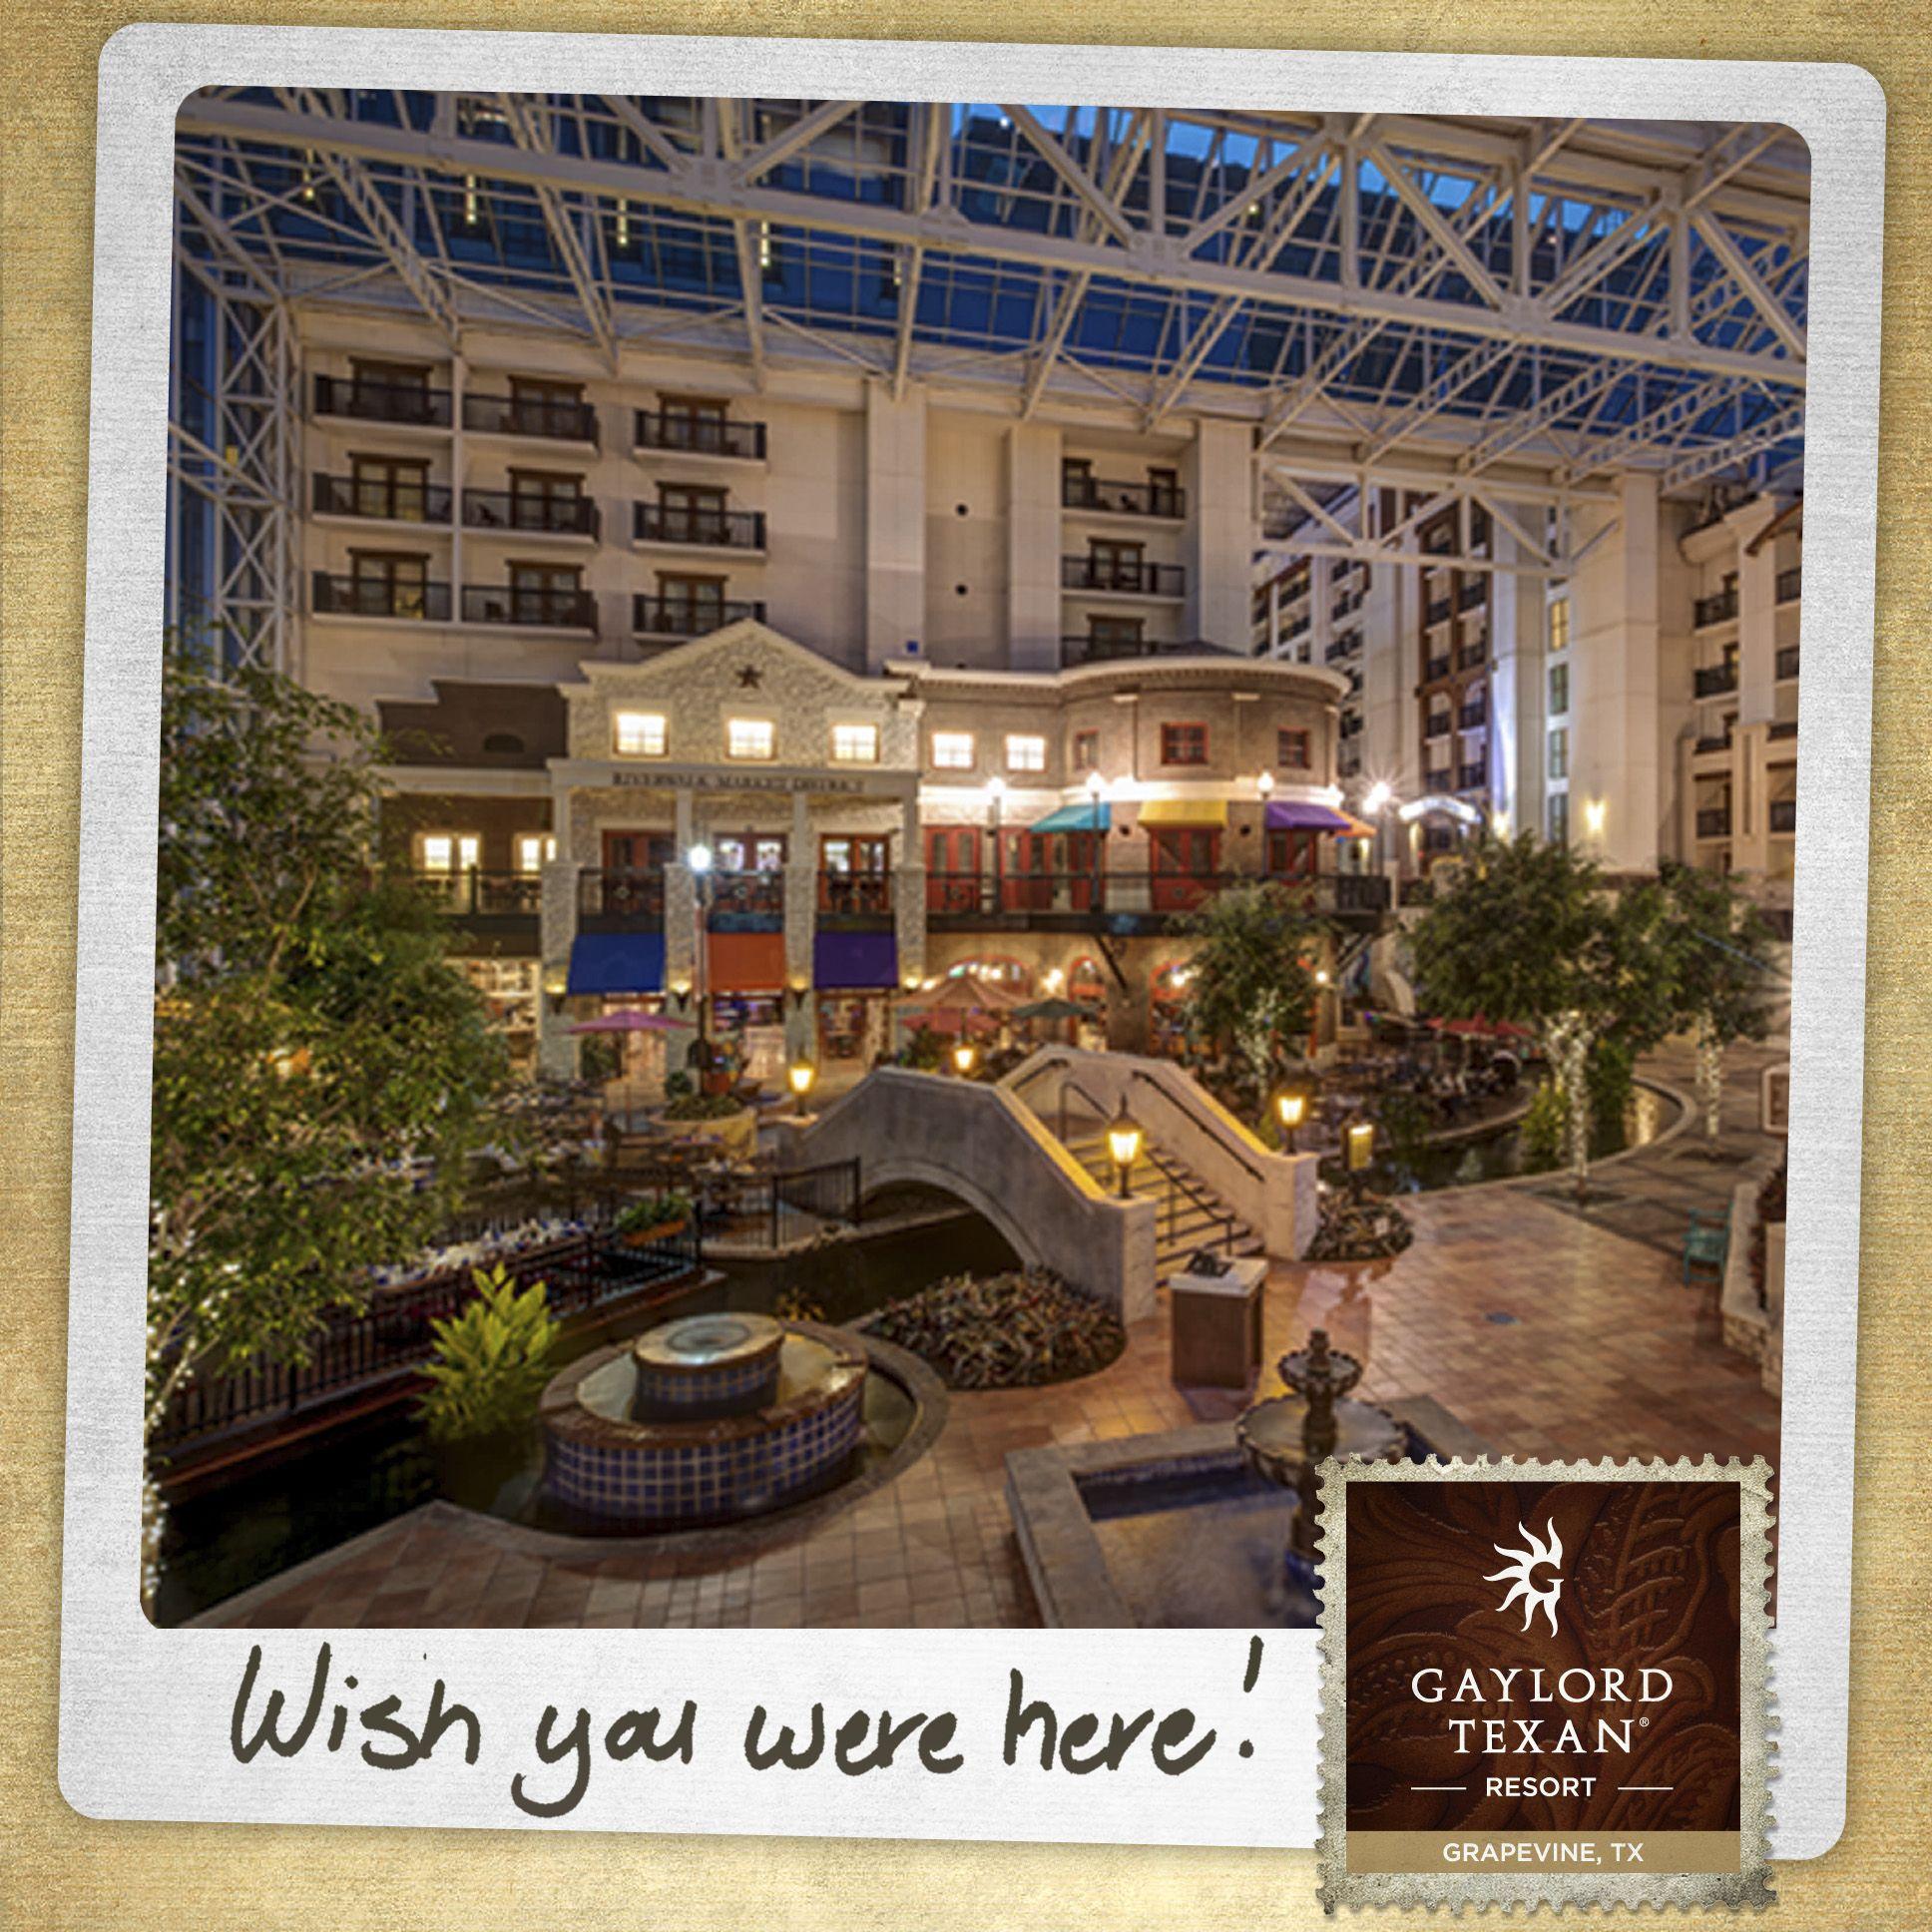 Best Kitchen Gallery: Gaylord Texan Resort In Grapevine Tx Riverwalk Atrium Sightseeing of Grapevine Texas Hotels And Resorts  on rachelxblog.com